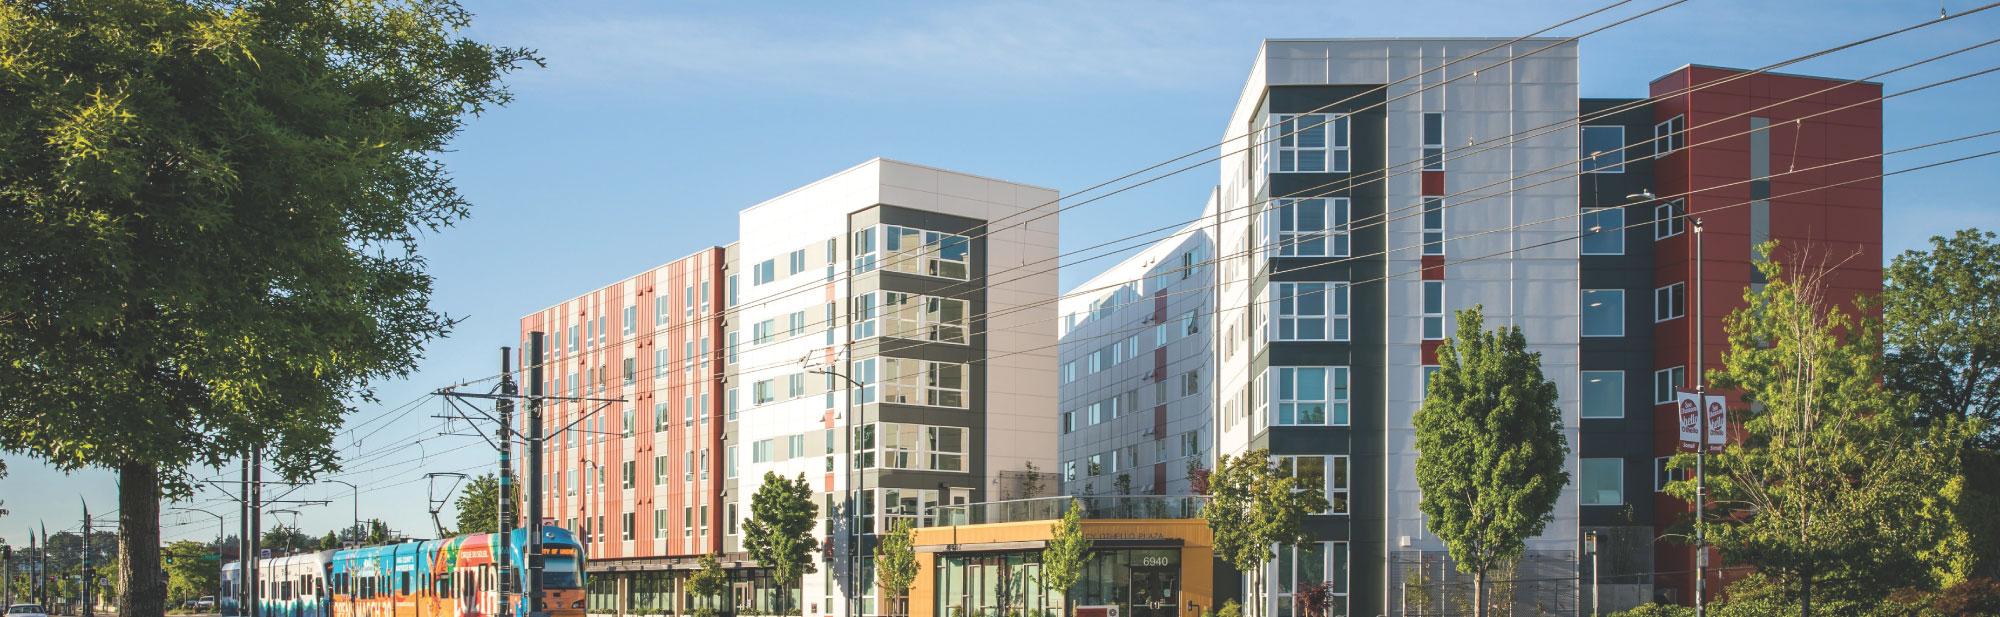 othello-mercy-housing-property